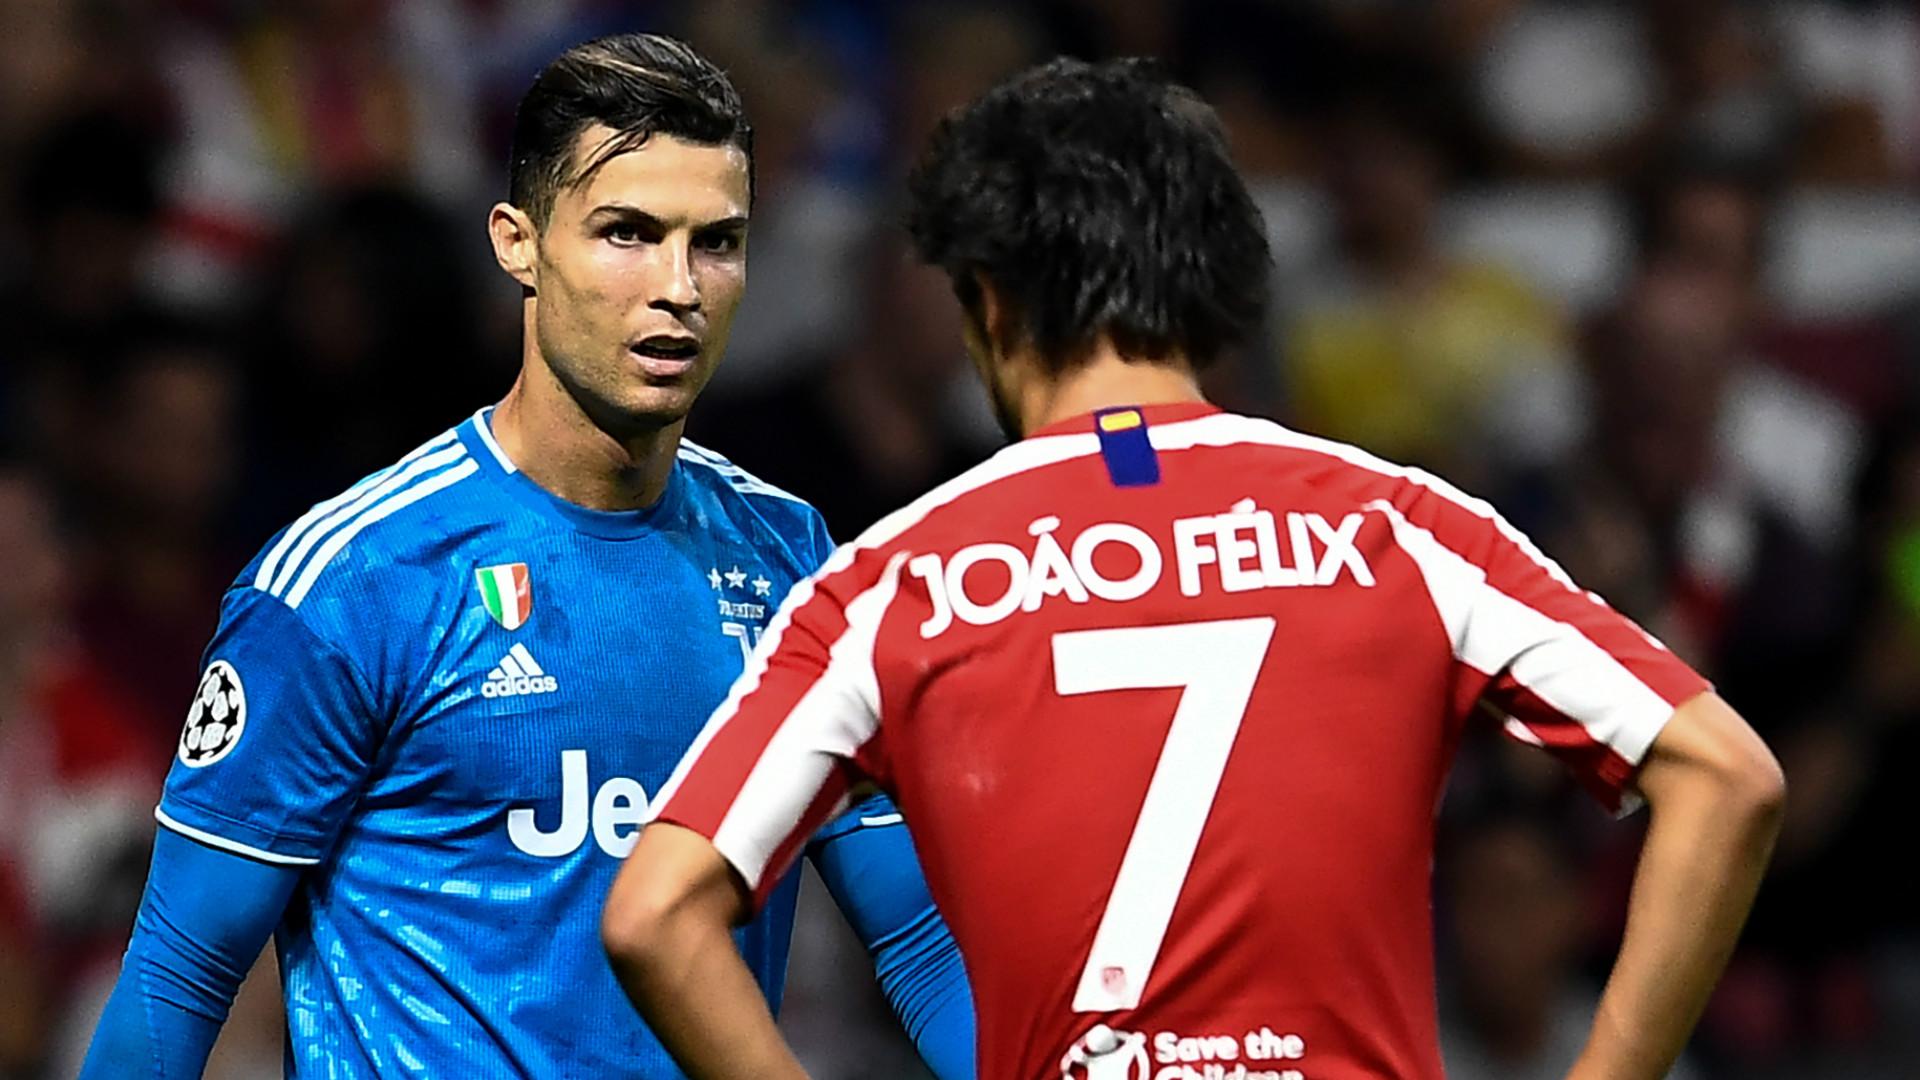 Cristiano Ronaldo Joao Felix Juventus Atletico Madrid 2019-20